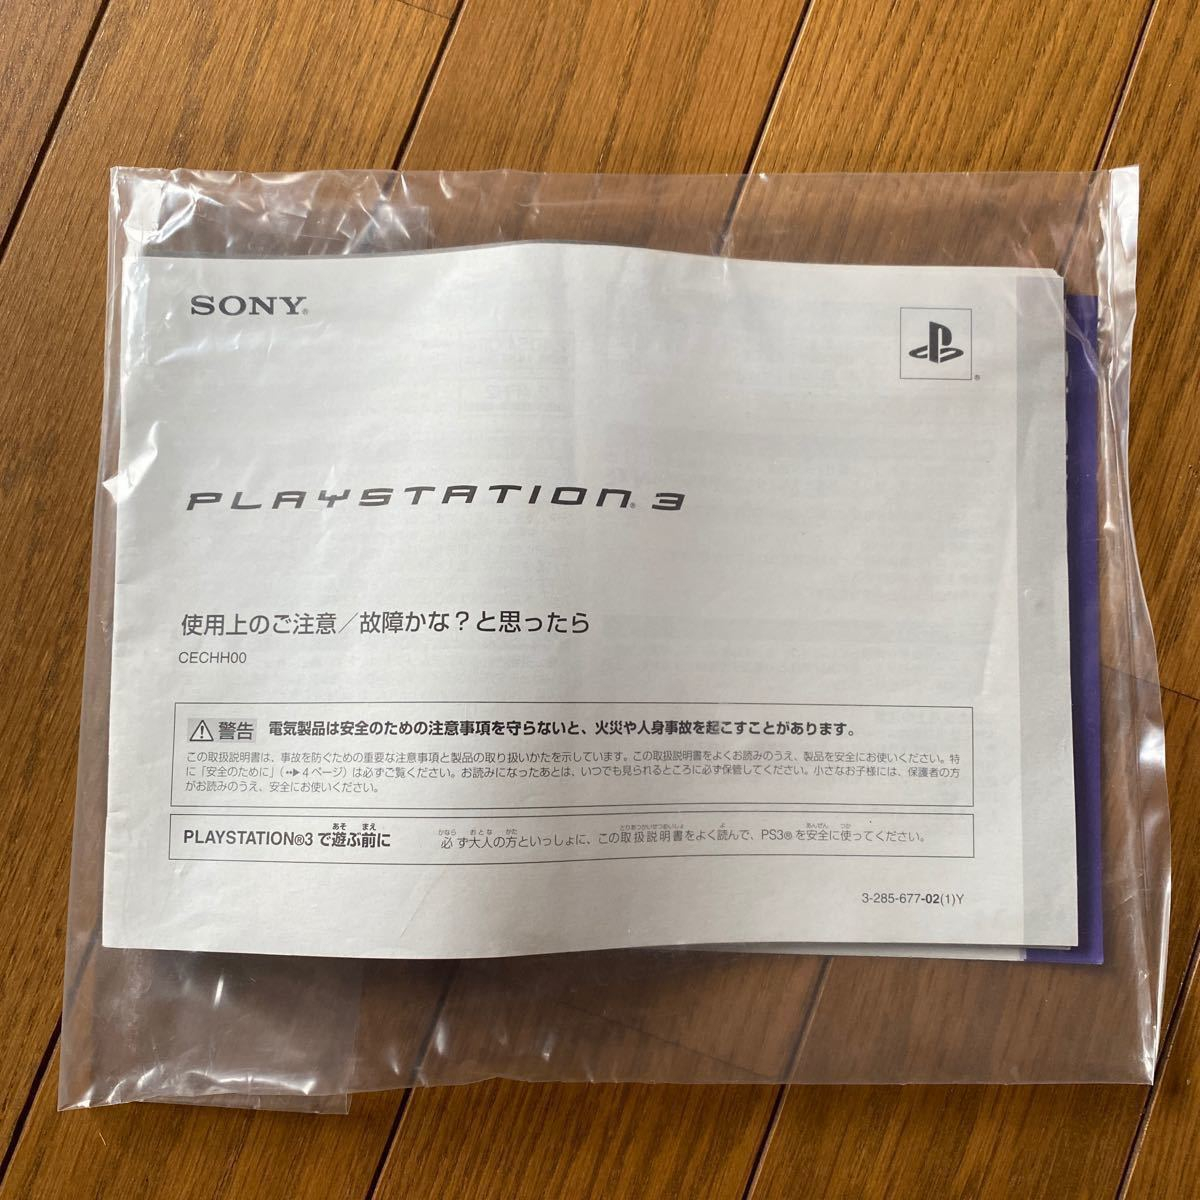 PS3本体 プレイステーション3 初期型 CECHH00 【ジャンク品】